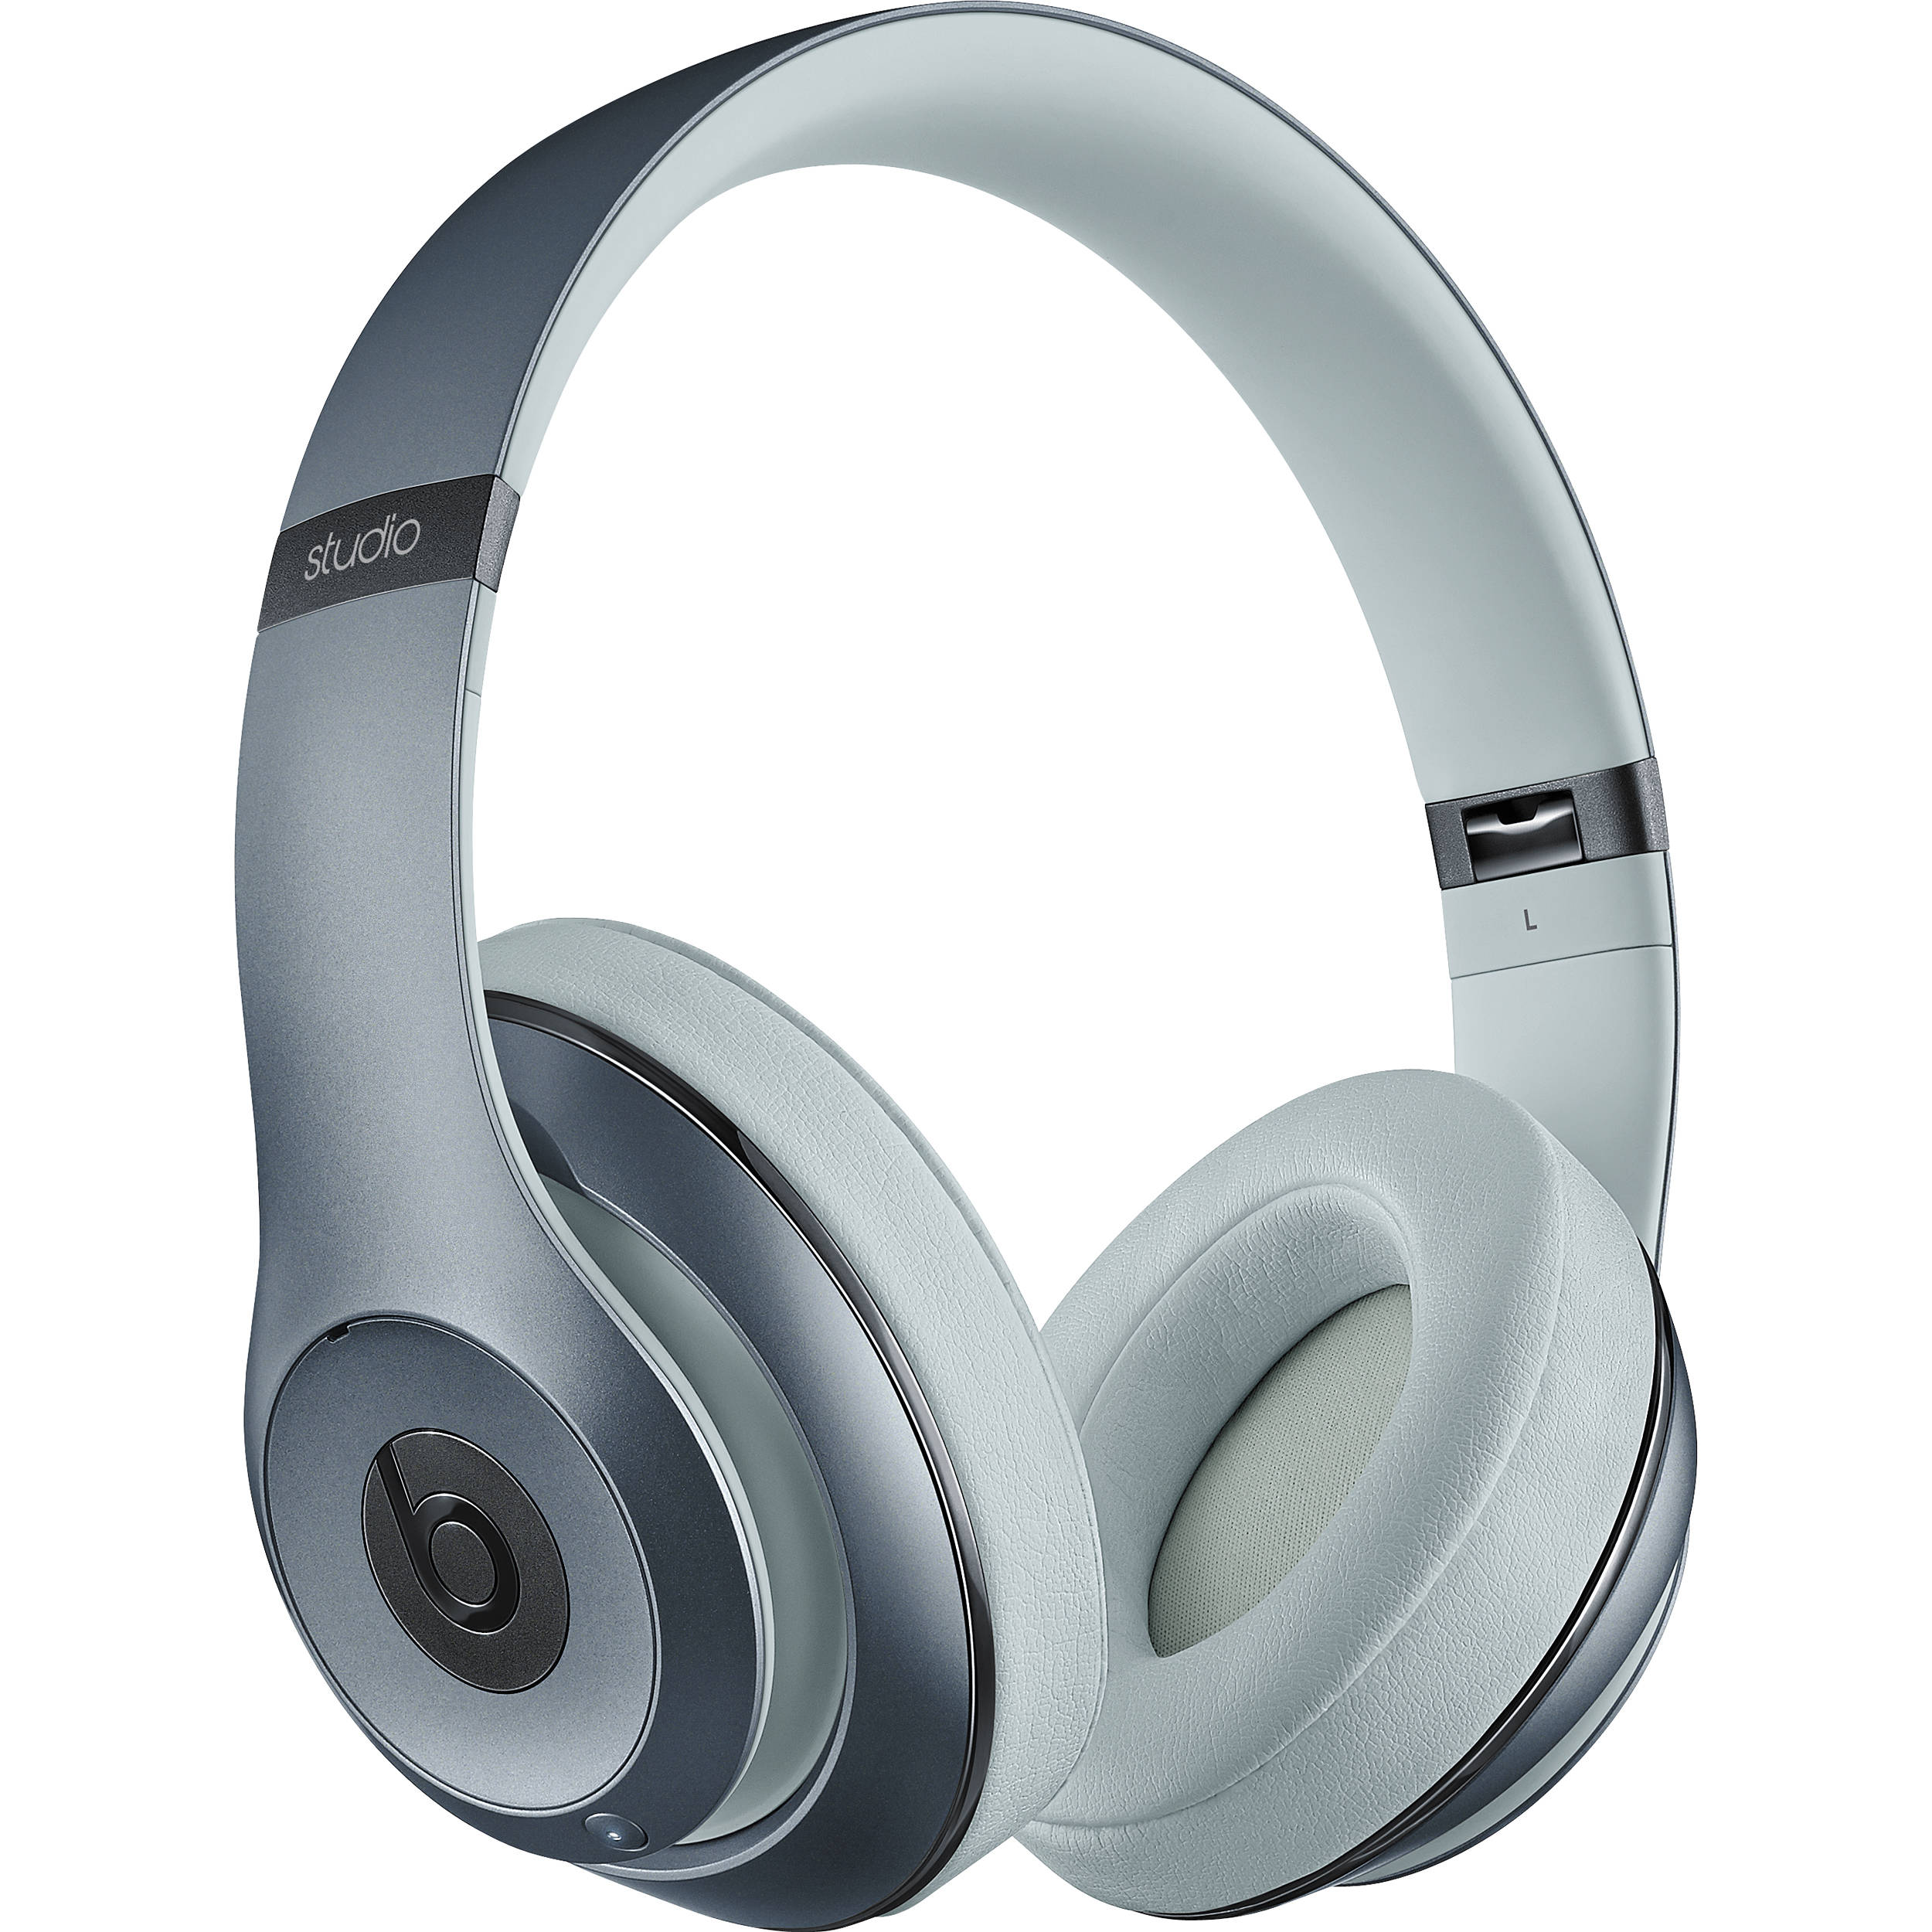 beats by dr dre studio wireless headphones mhdl2am a b h. Black Bedroom Furniture Sets. Home Design Ideas